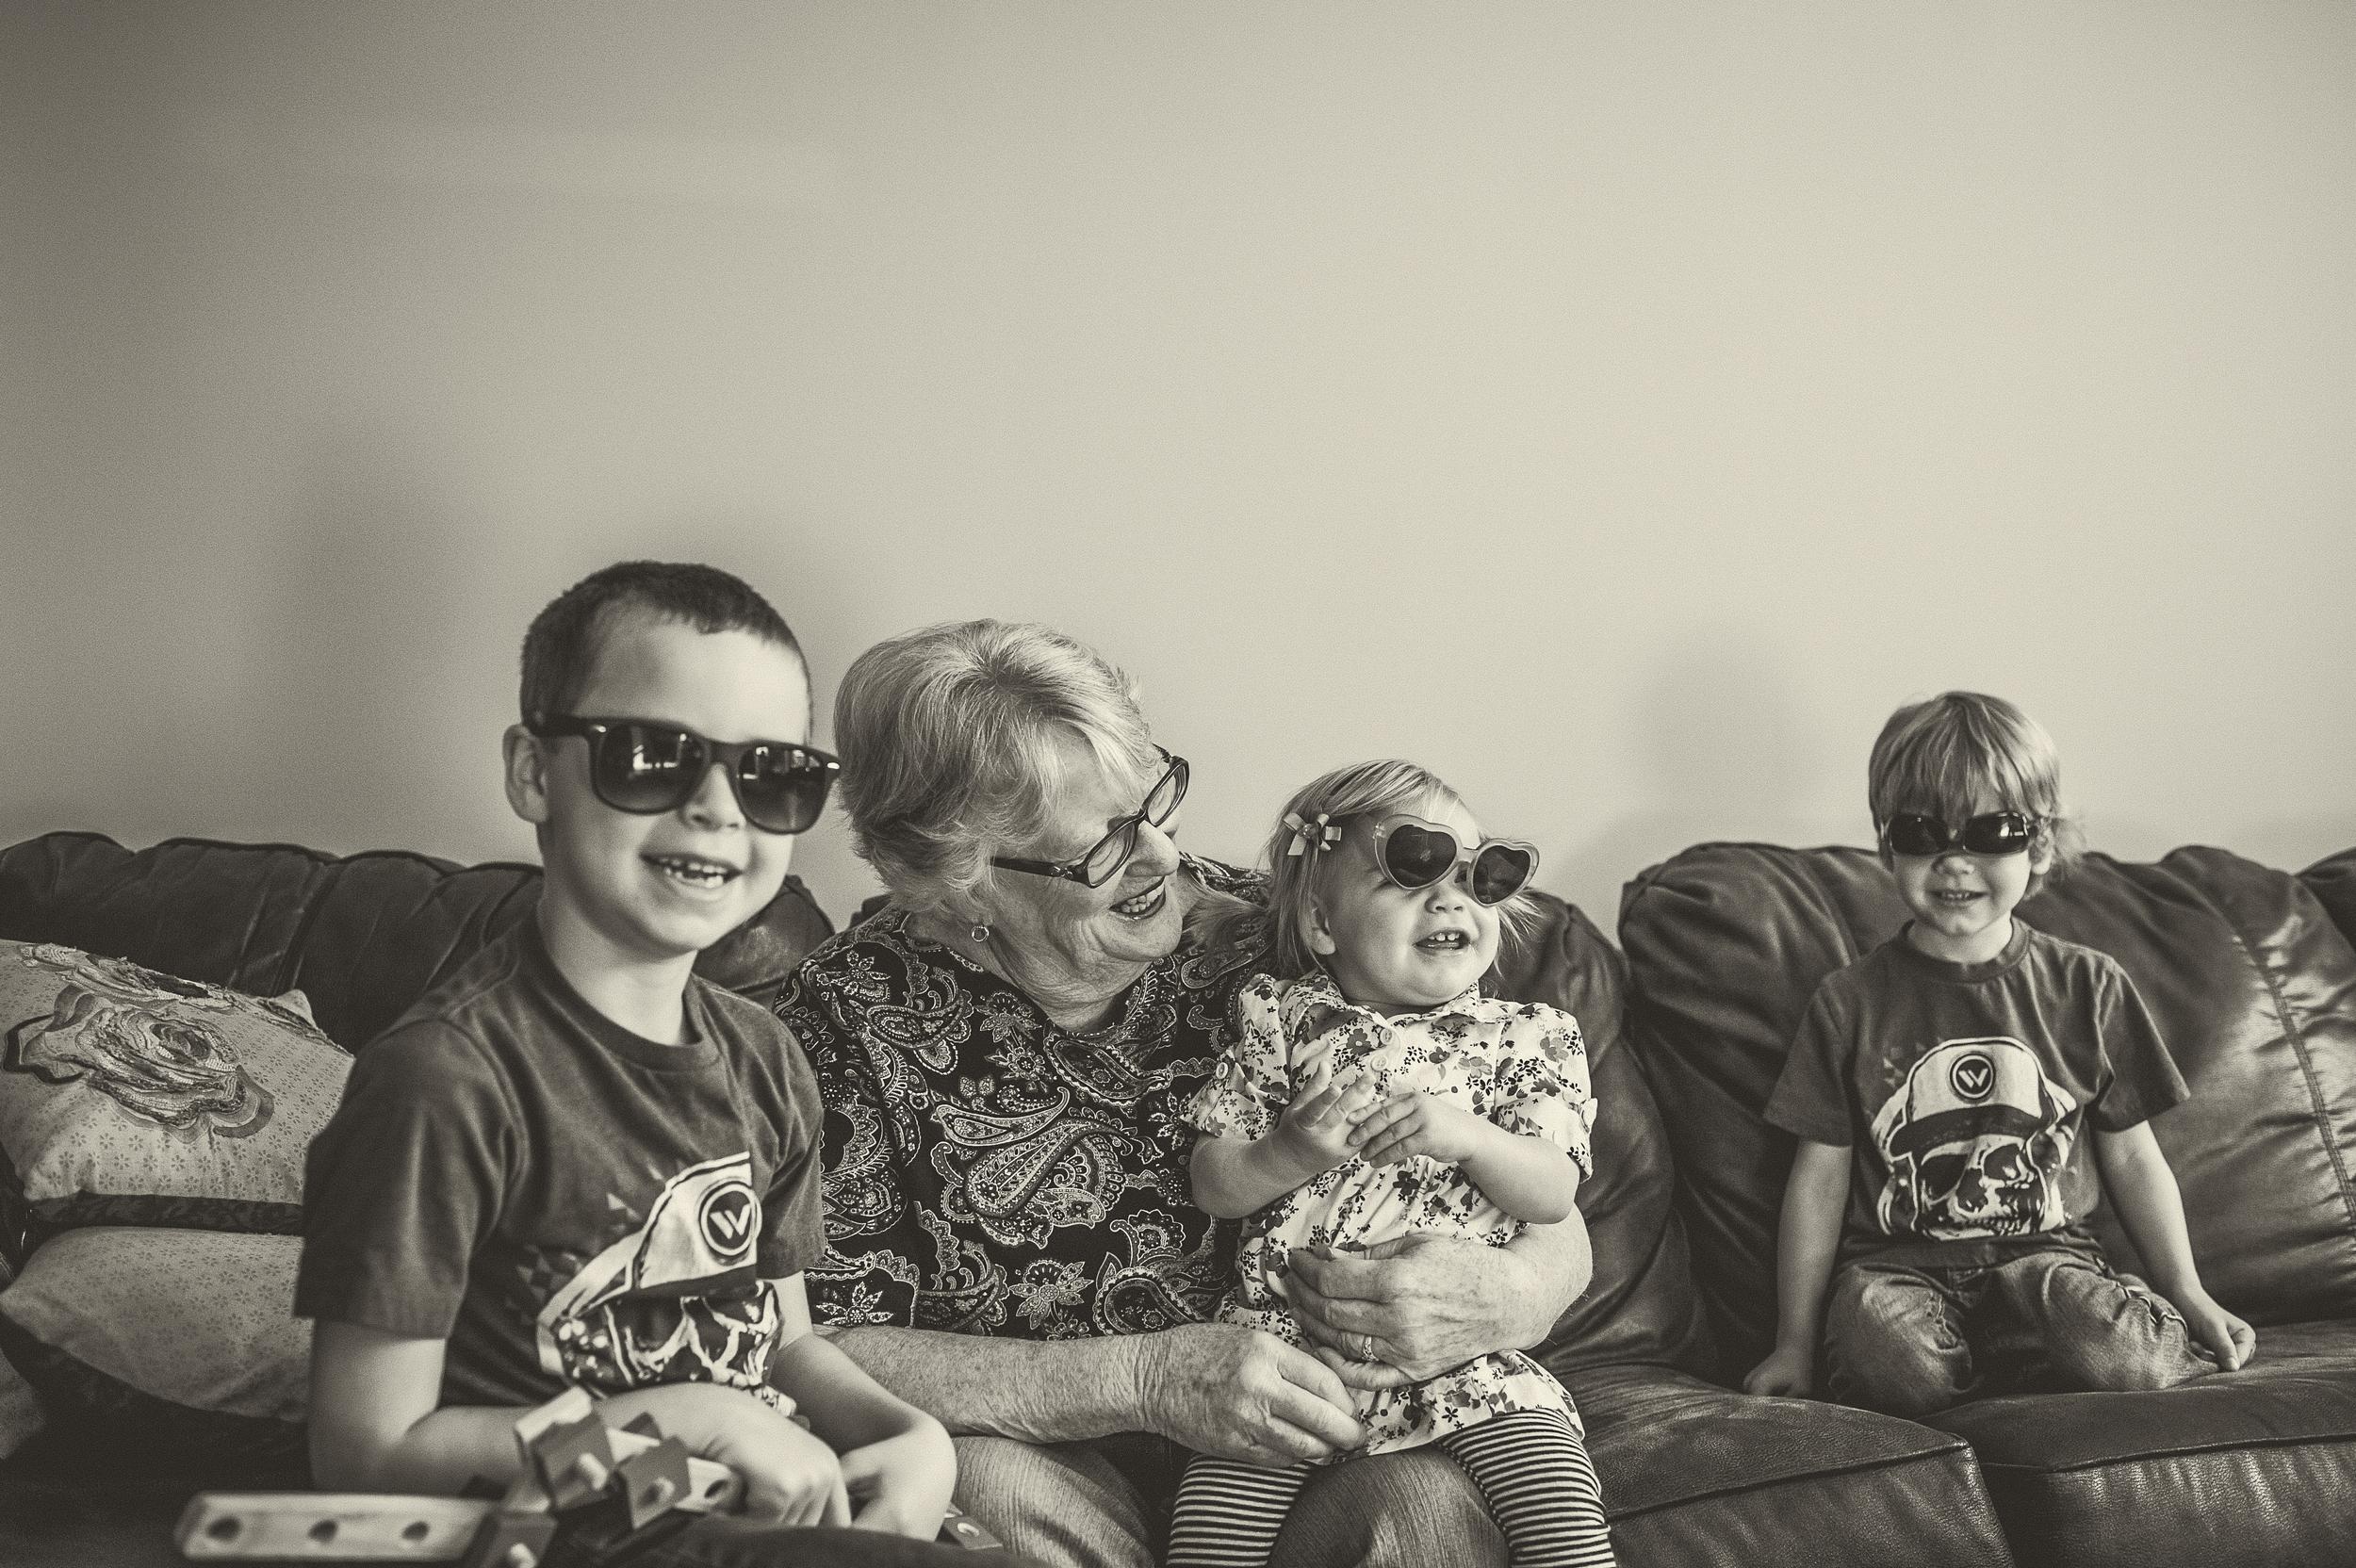 Lifestyle family photo shoot. April 2015. Crofton, MD.